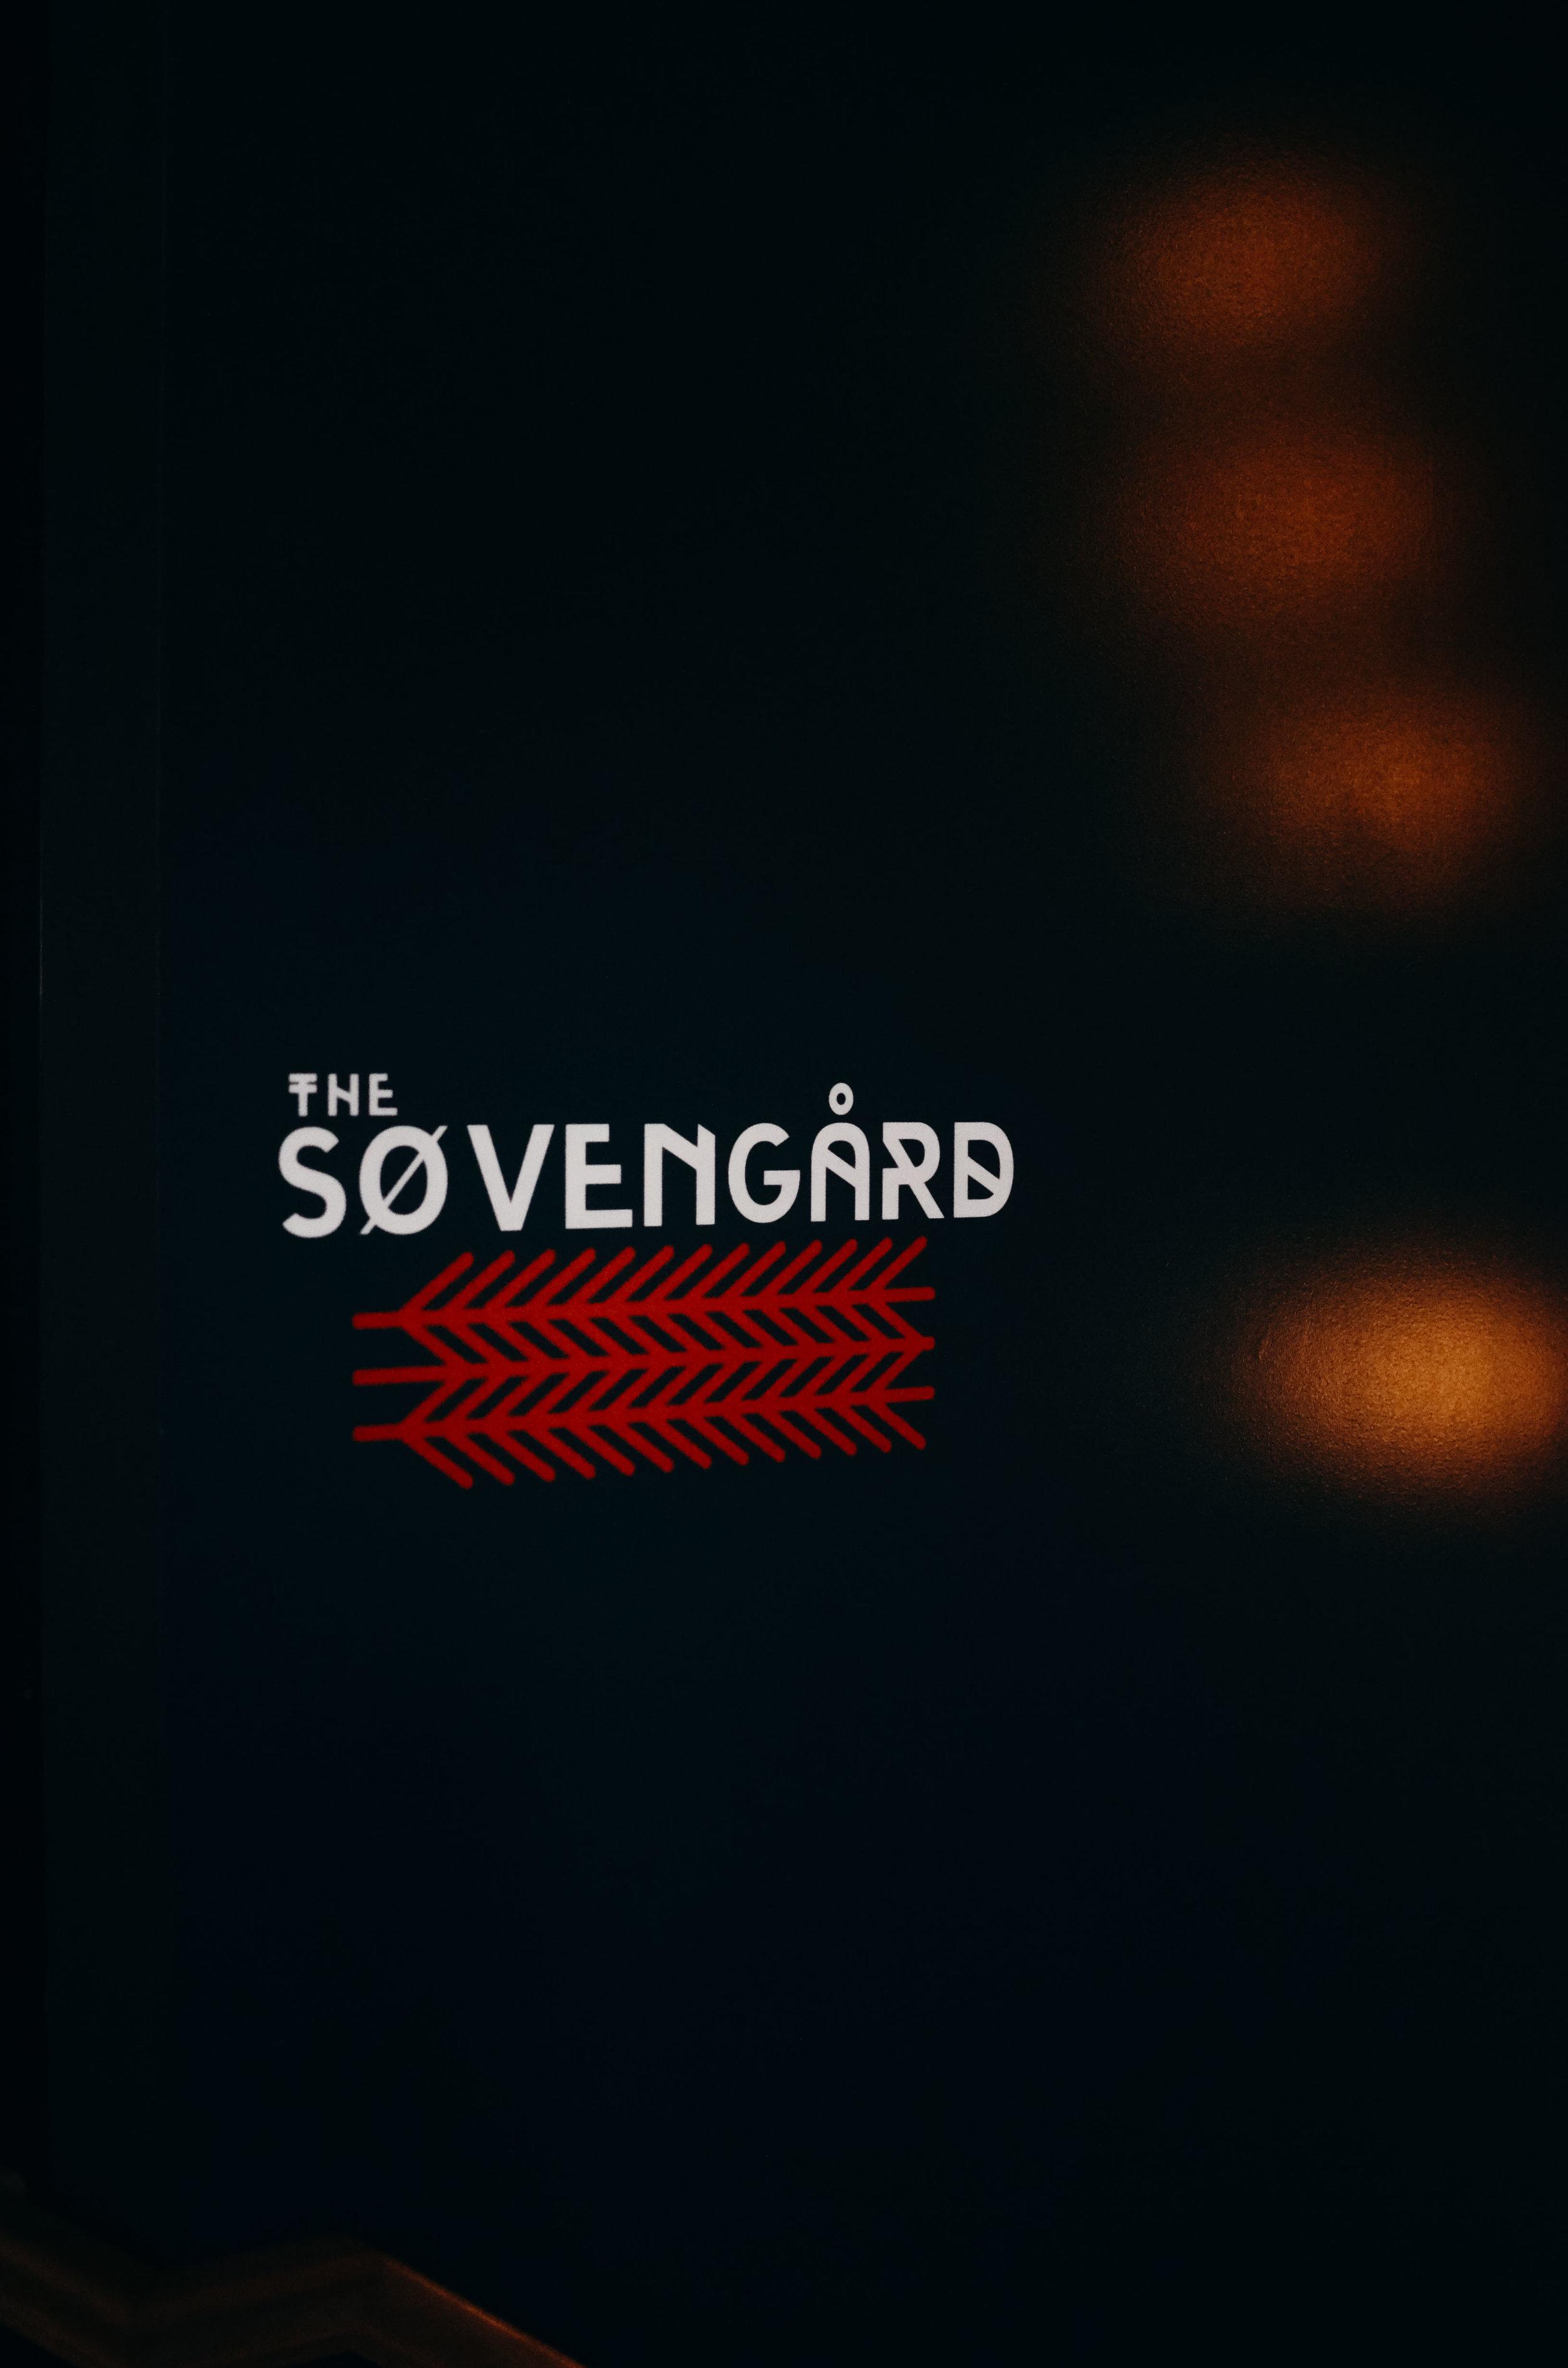 Wendling_Boyd_The_Sovengard_Dinner_With_Loved_Ones-18.jpg